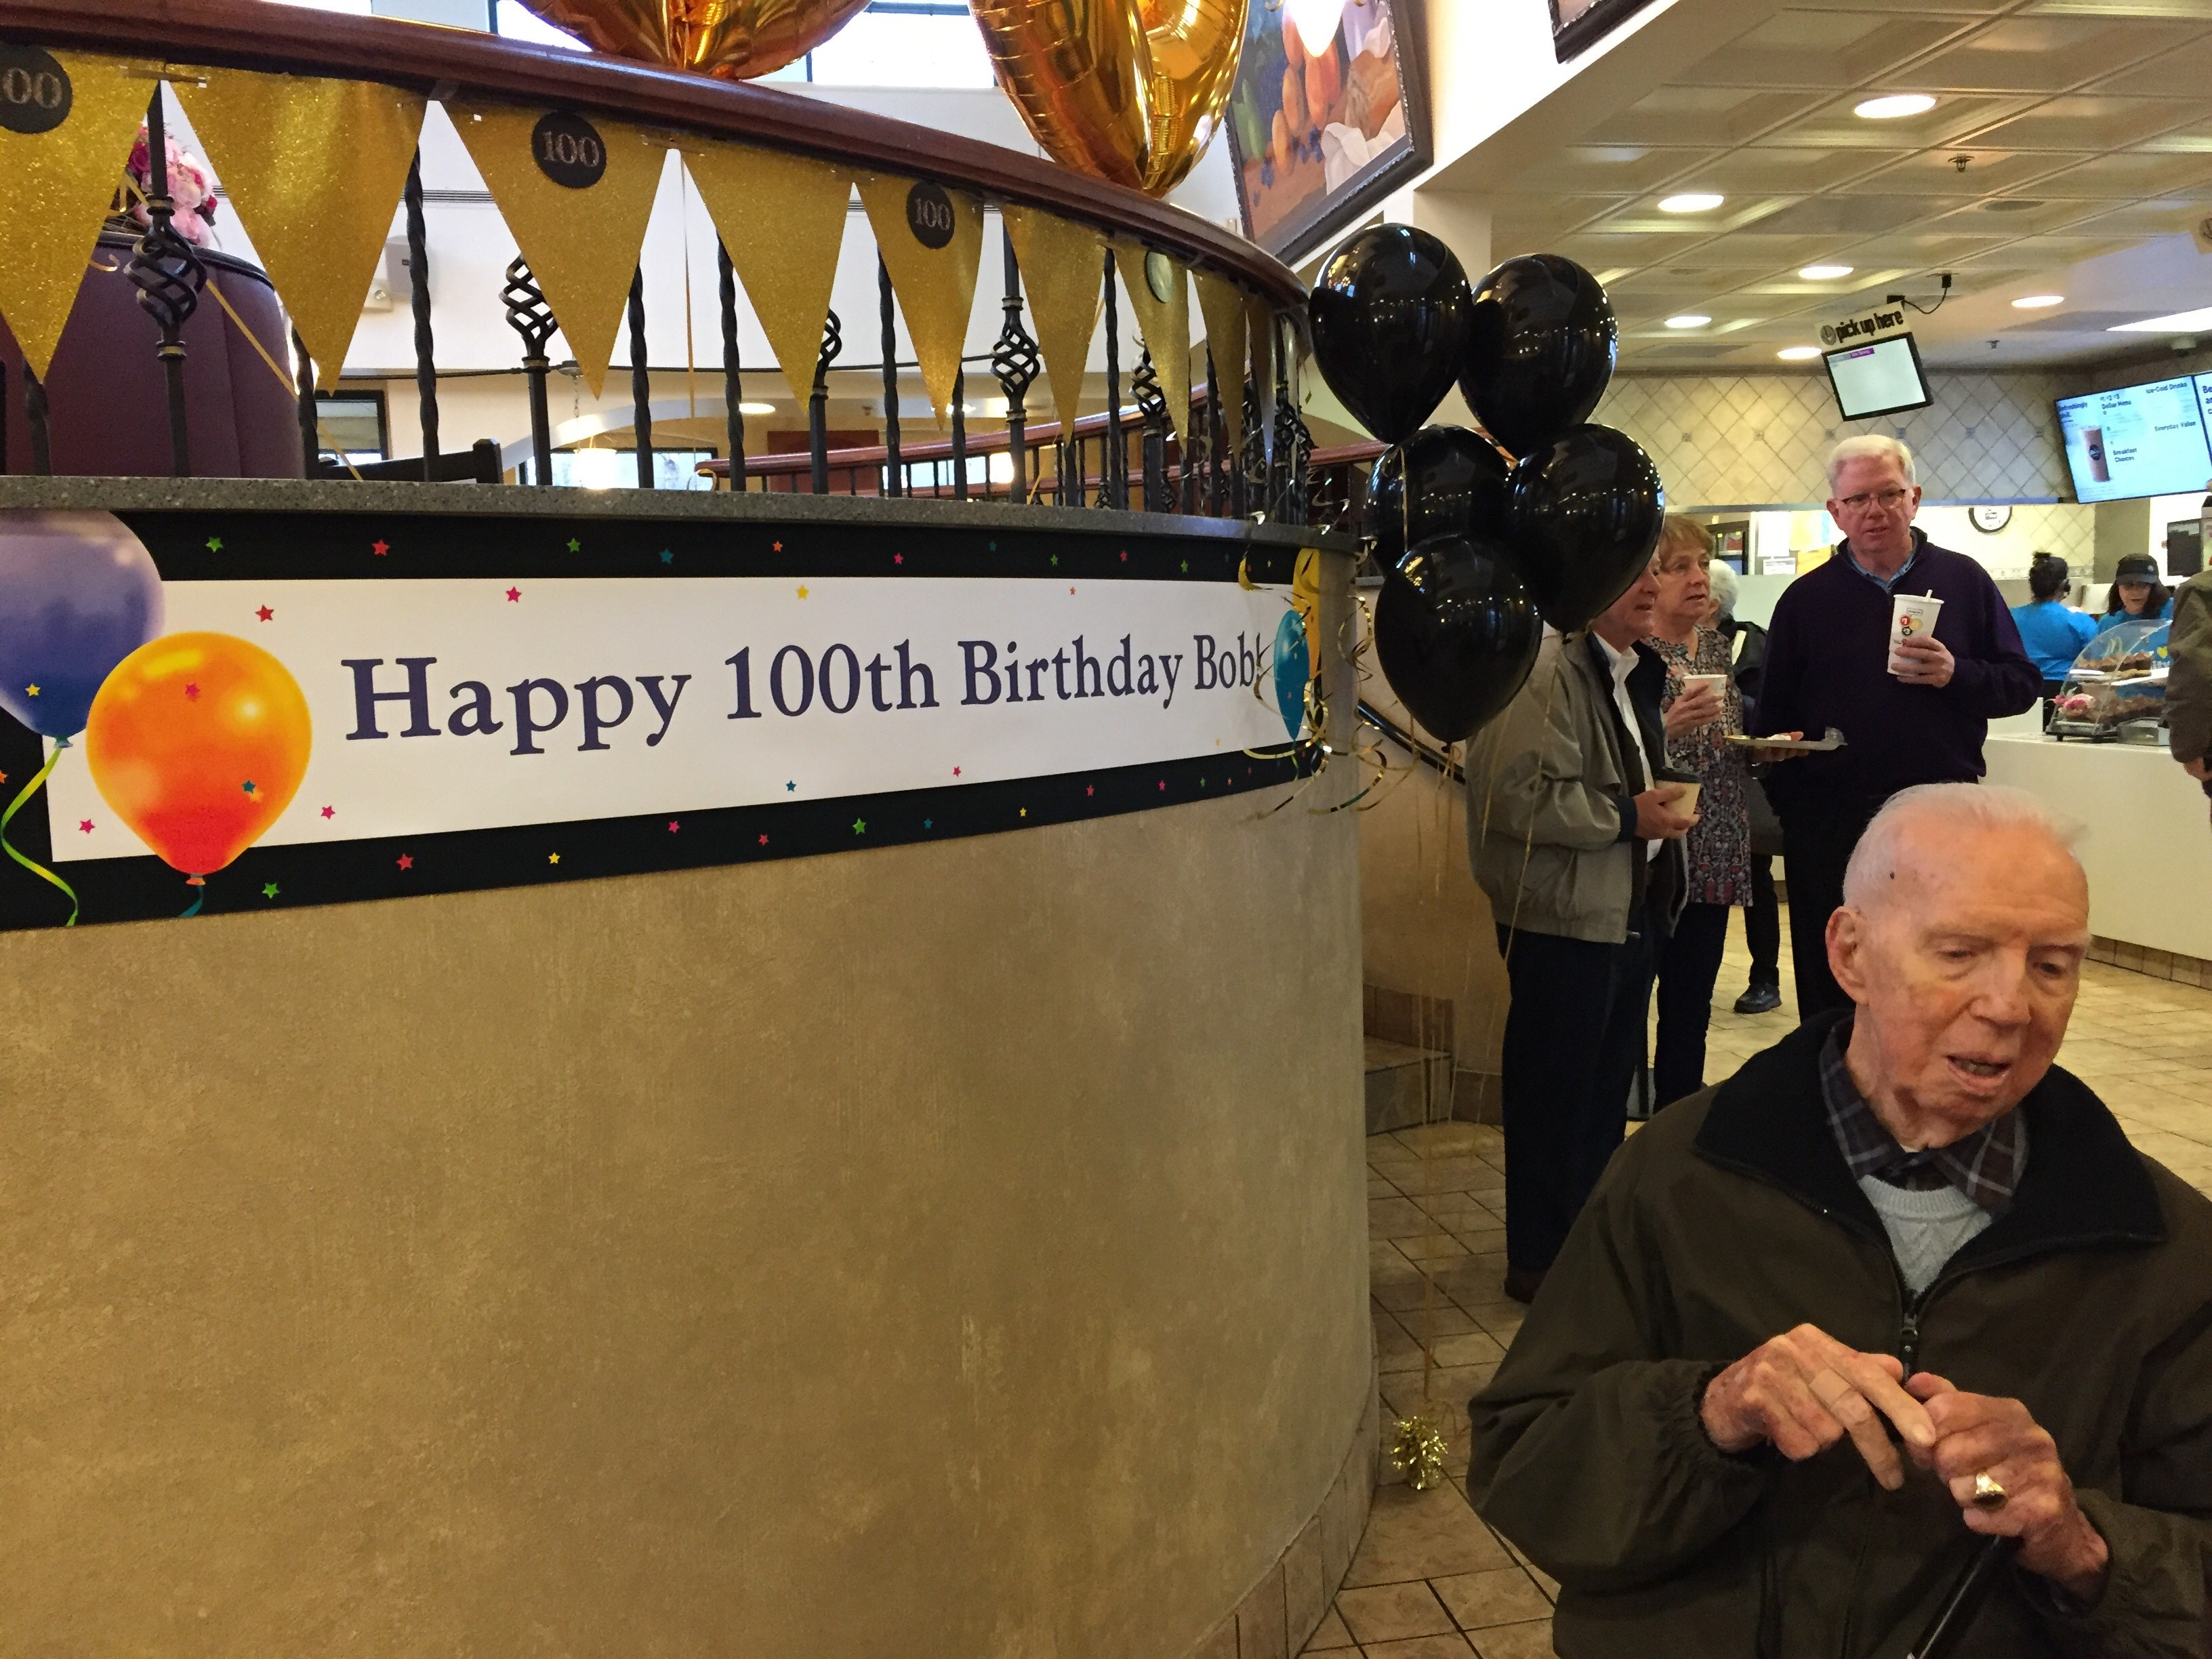 "<div class=""meta image-caption""><div class=""origin-logo origin-image wls""><span>WLS</span></div><span class=""caption-text"">Bob McCarthy celebrates his 100th birthday at the McDonald's on York Road in Hinsdale.</span></div>"